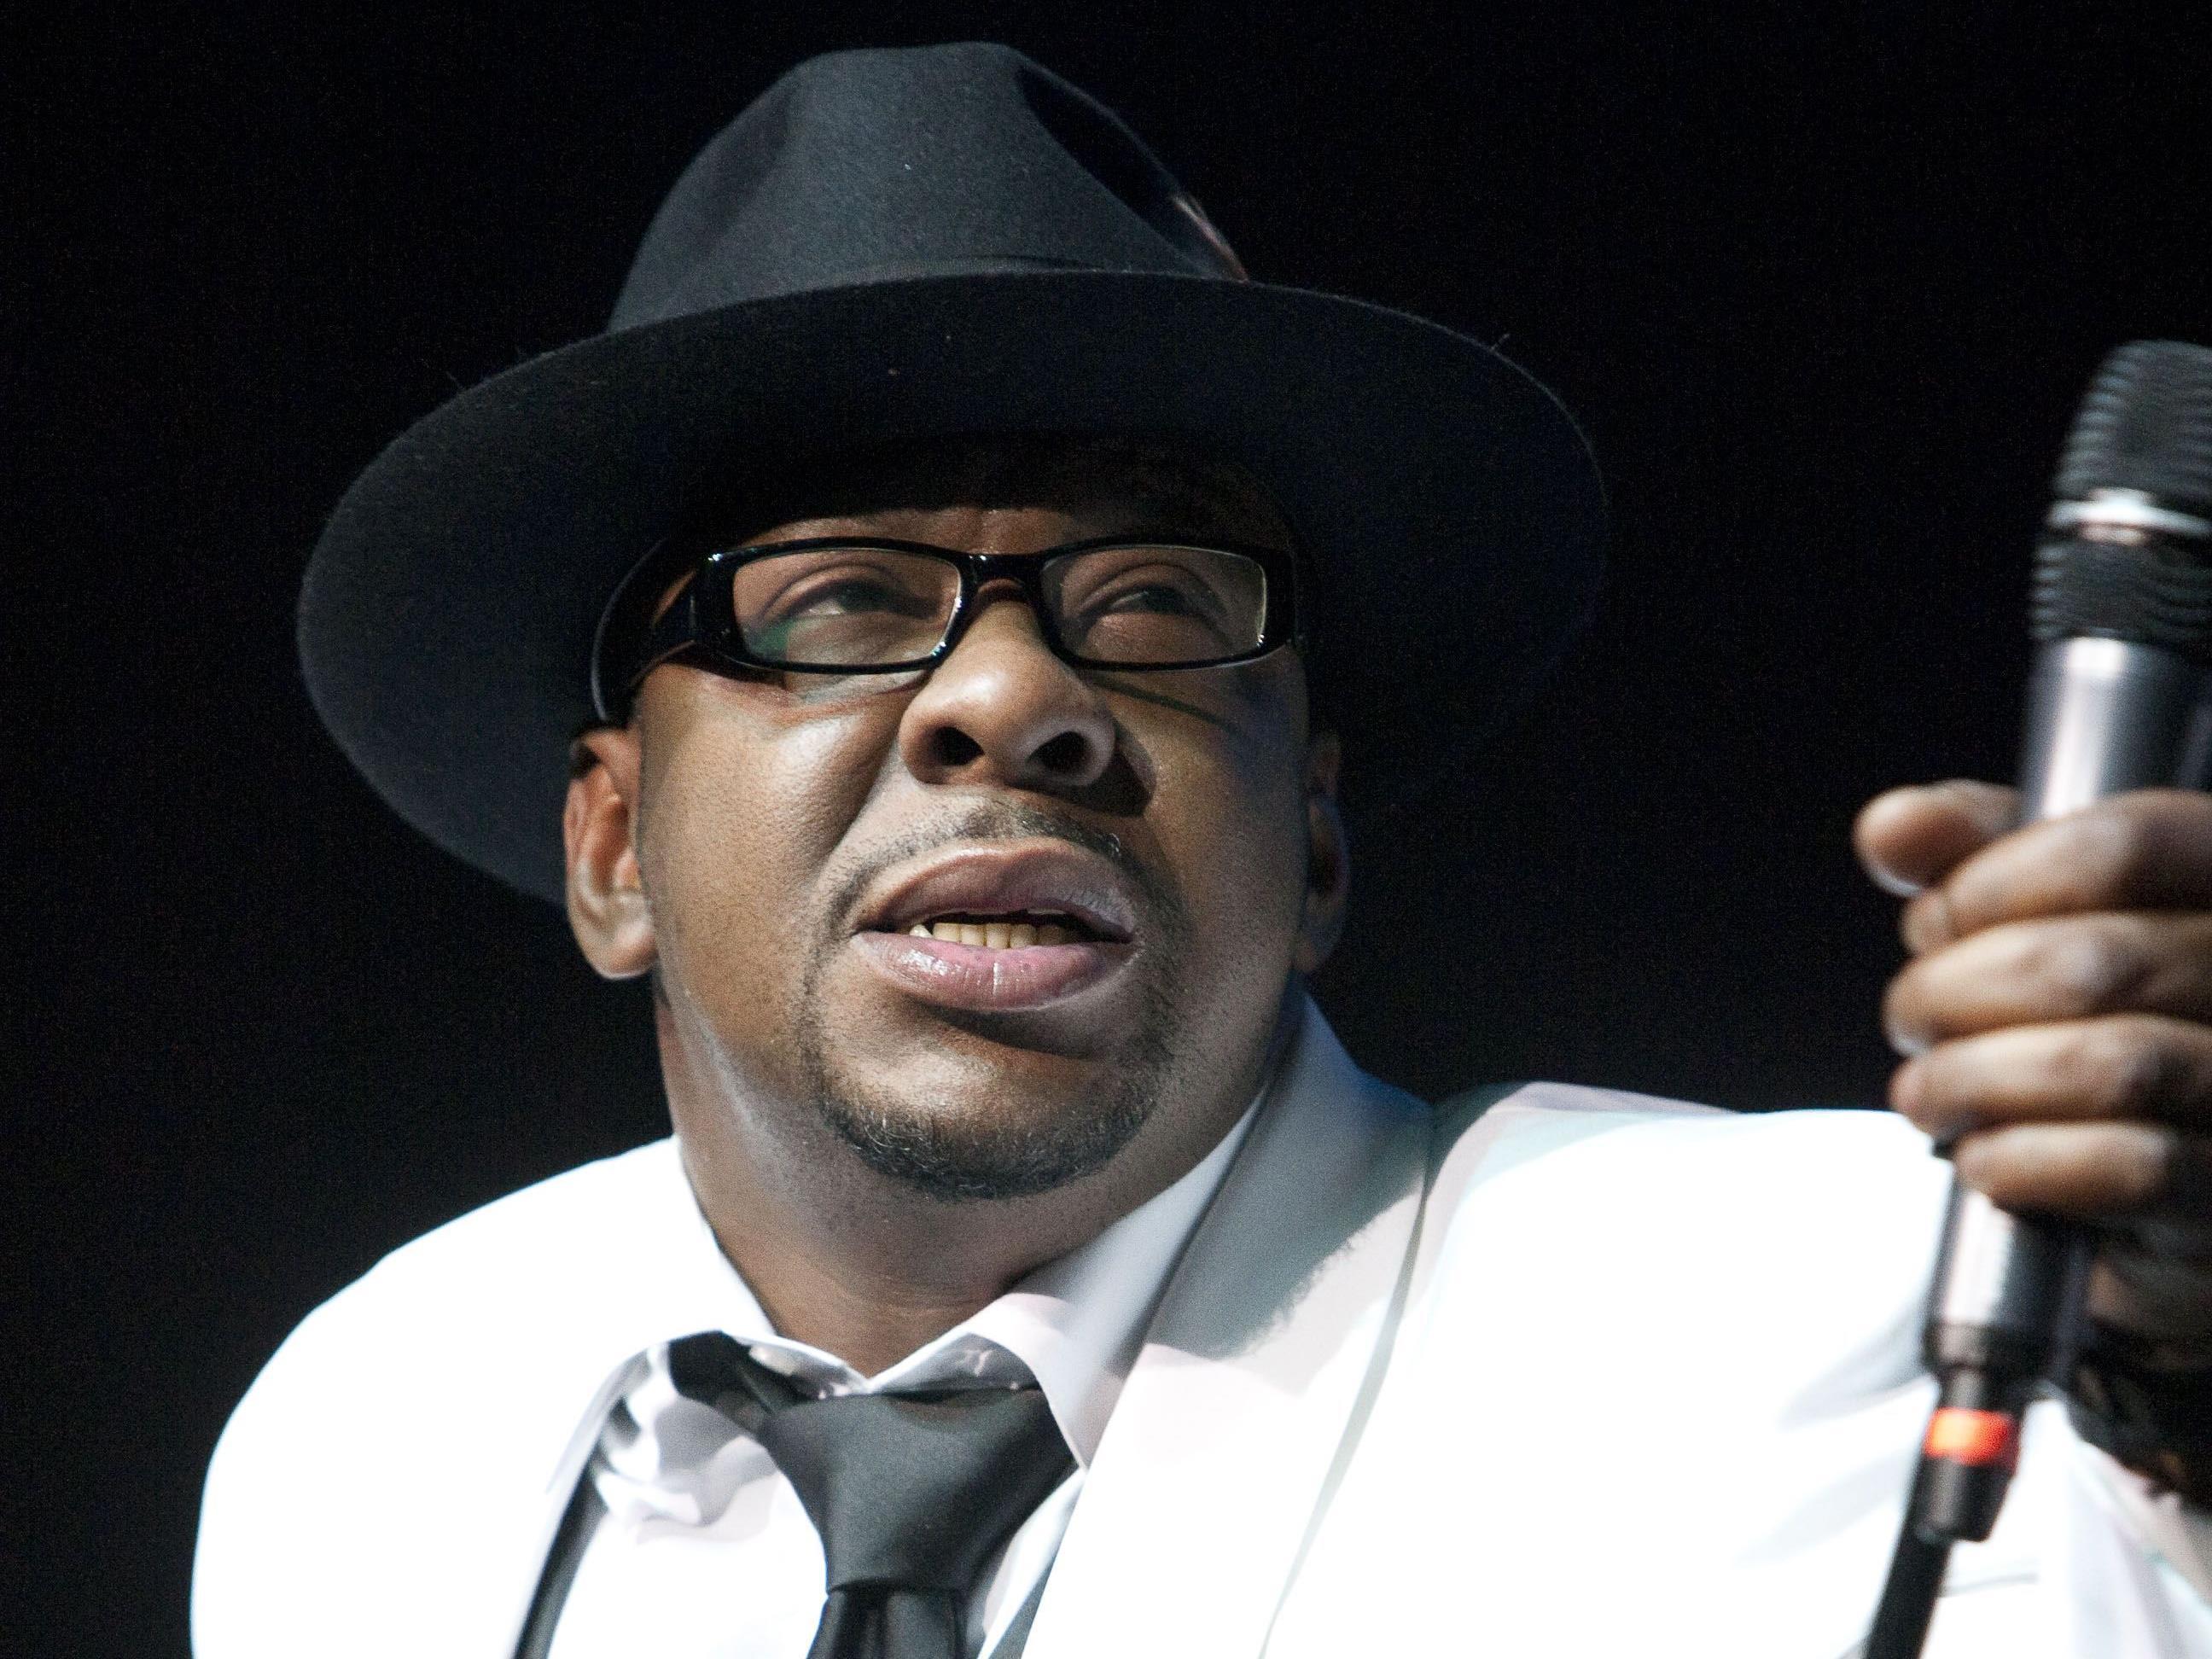 Grammy-Preisträger Brown saß wiederholt wegen Alkohol- und Drogendelikten hinter Gittern.